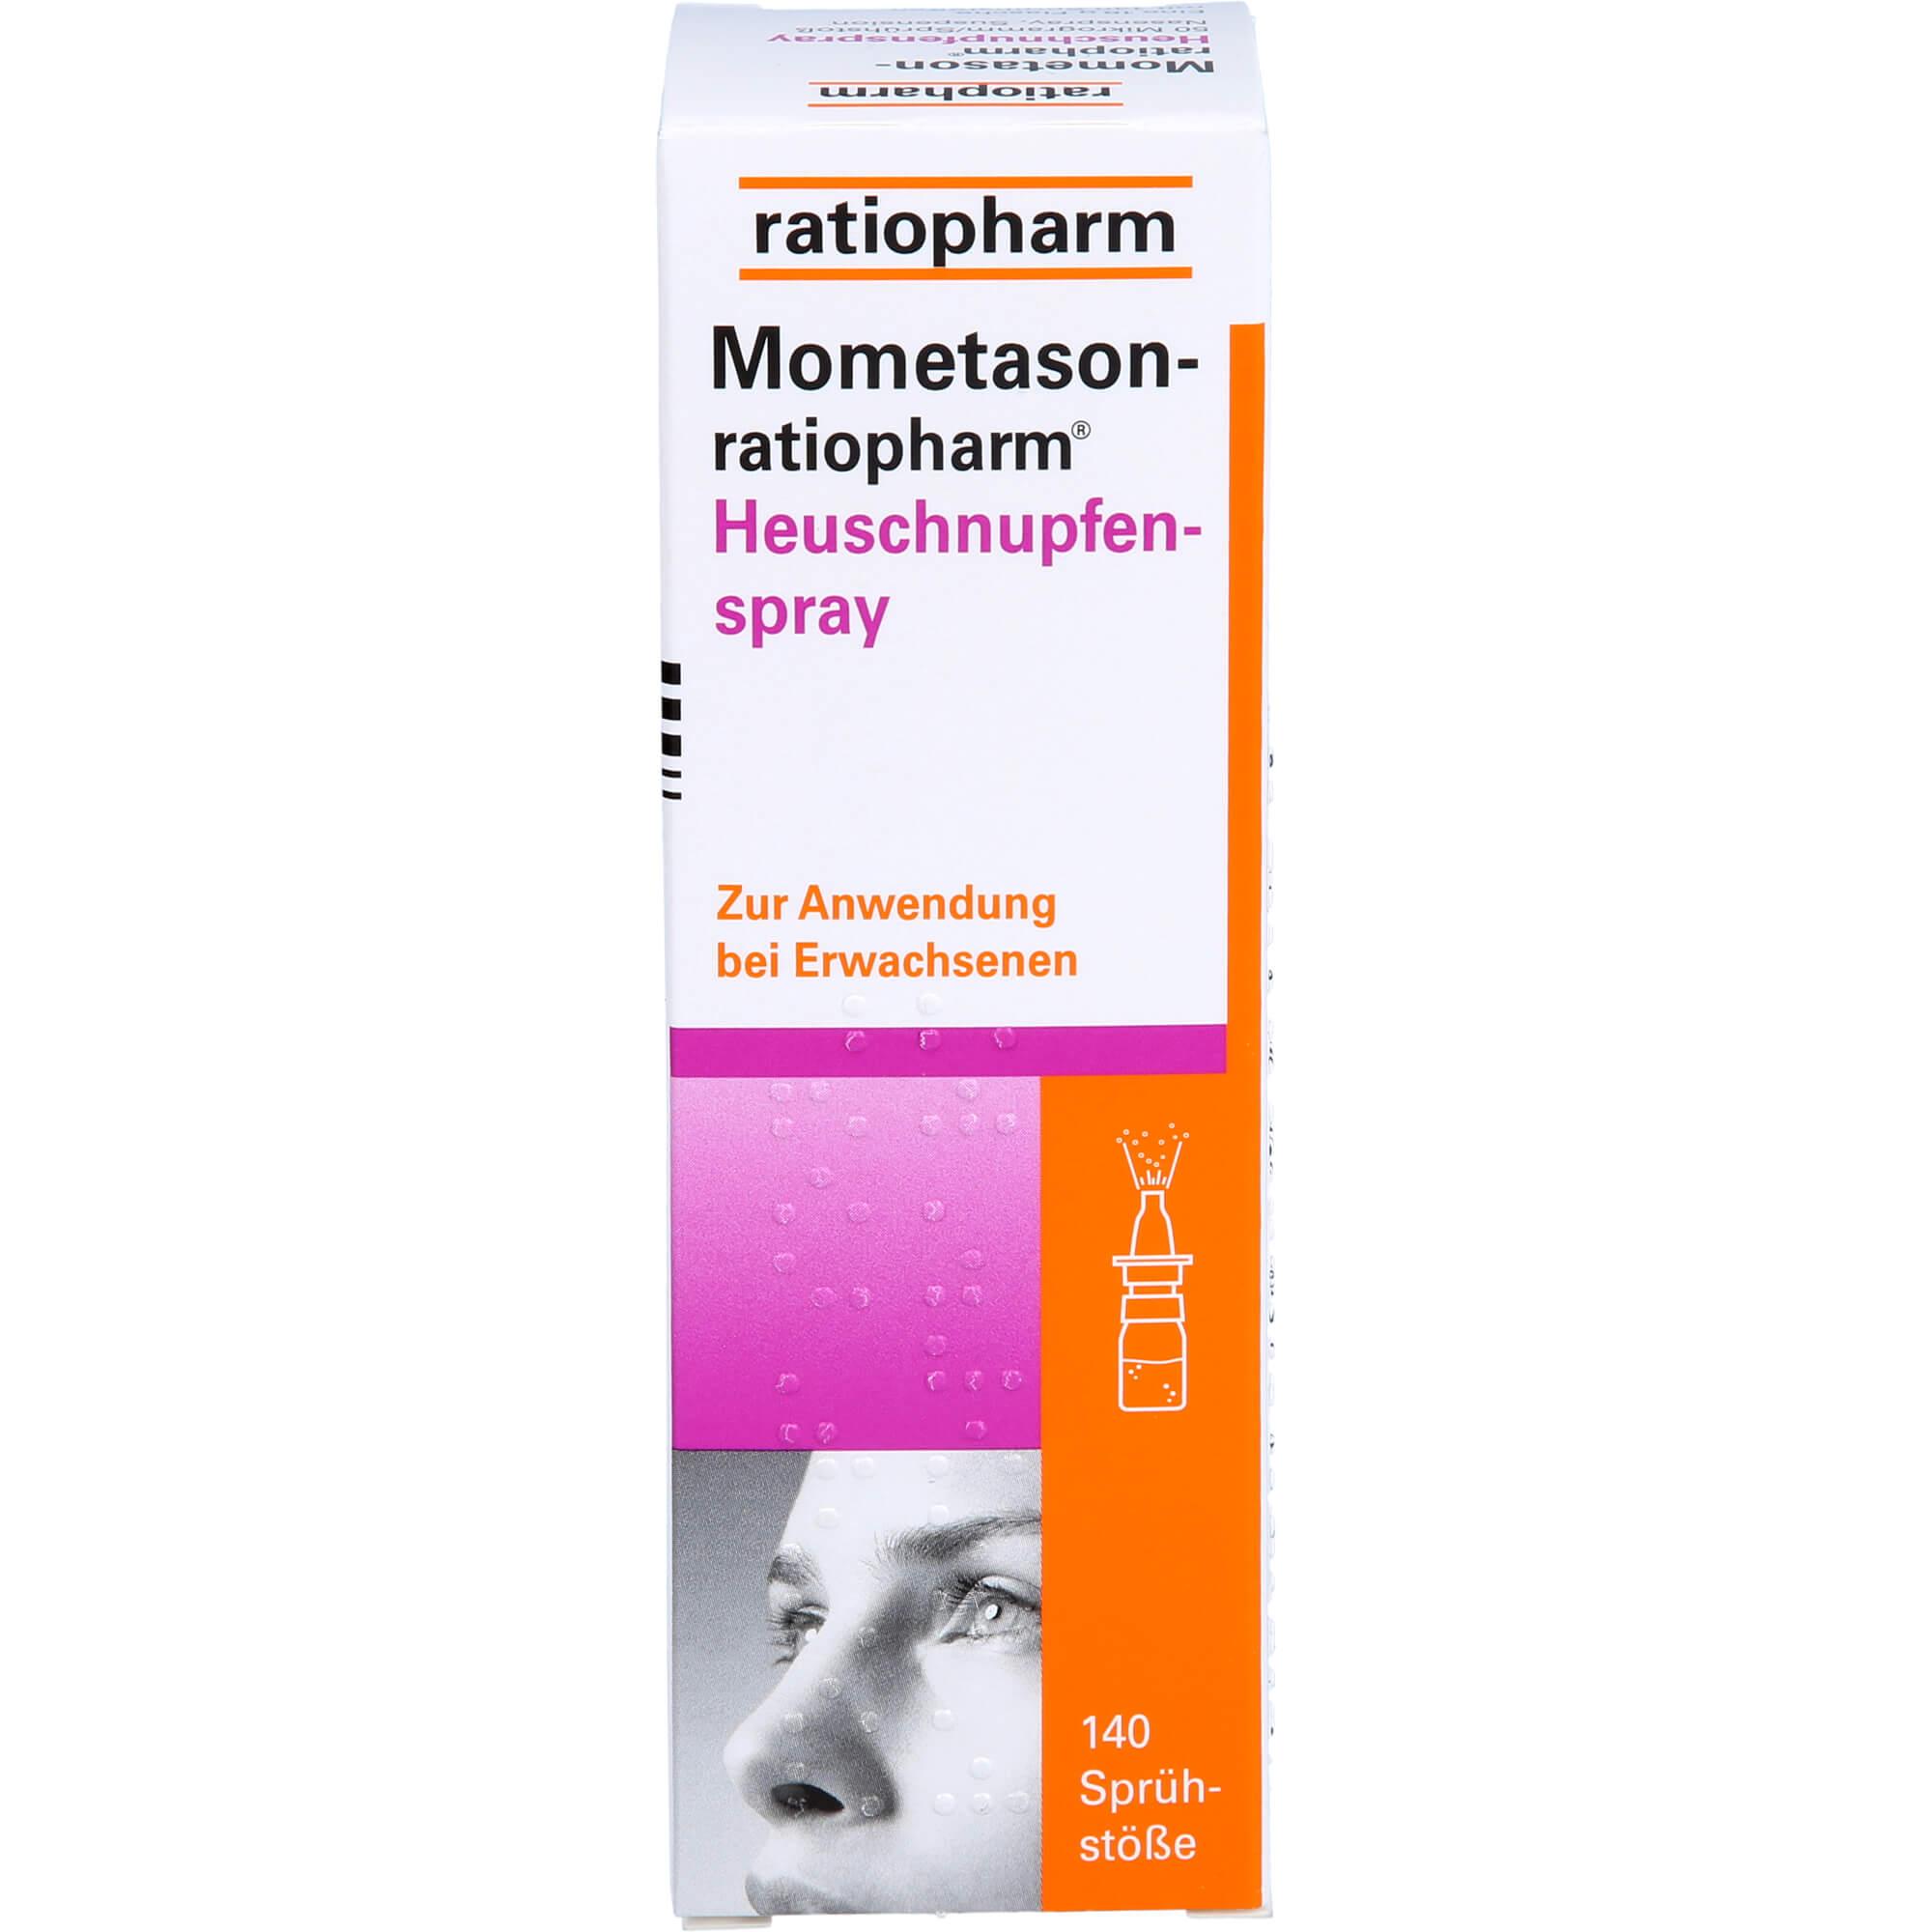 MOMETASON-ratiopharm-Heuschnupfenspray-140-Spruehstoesse